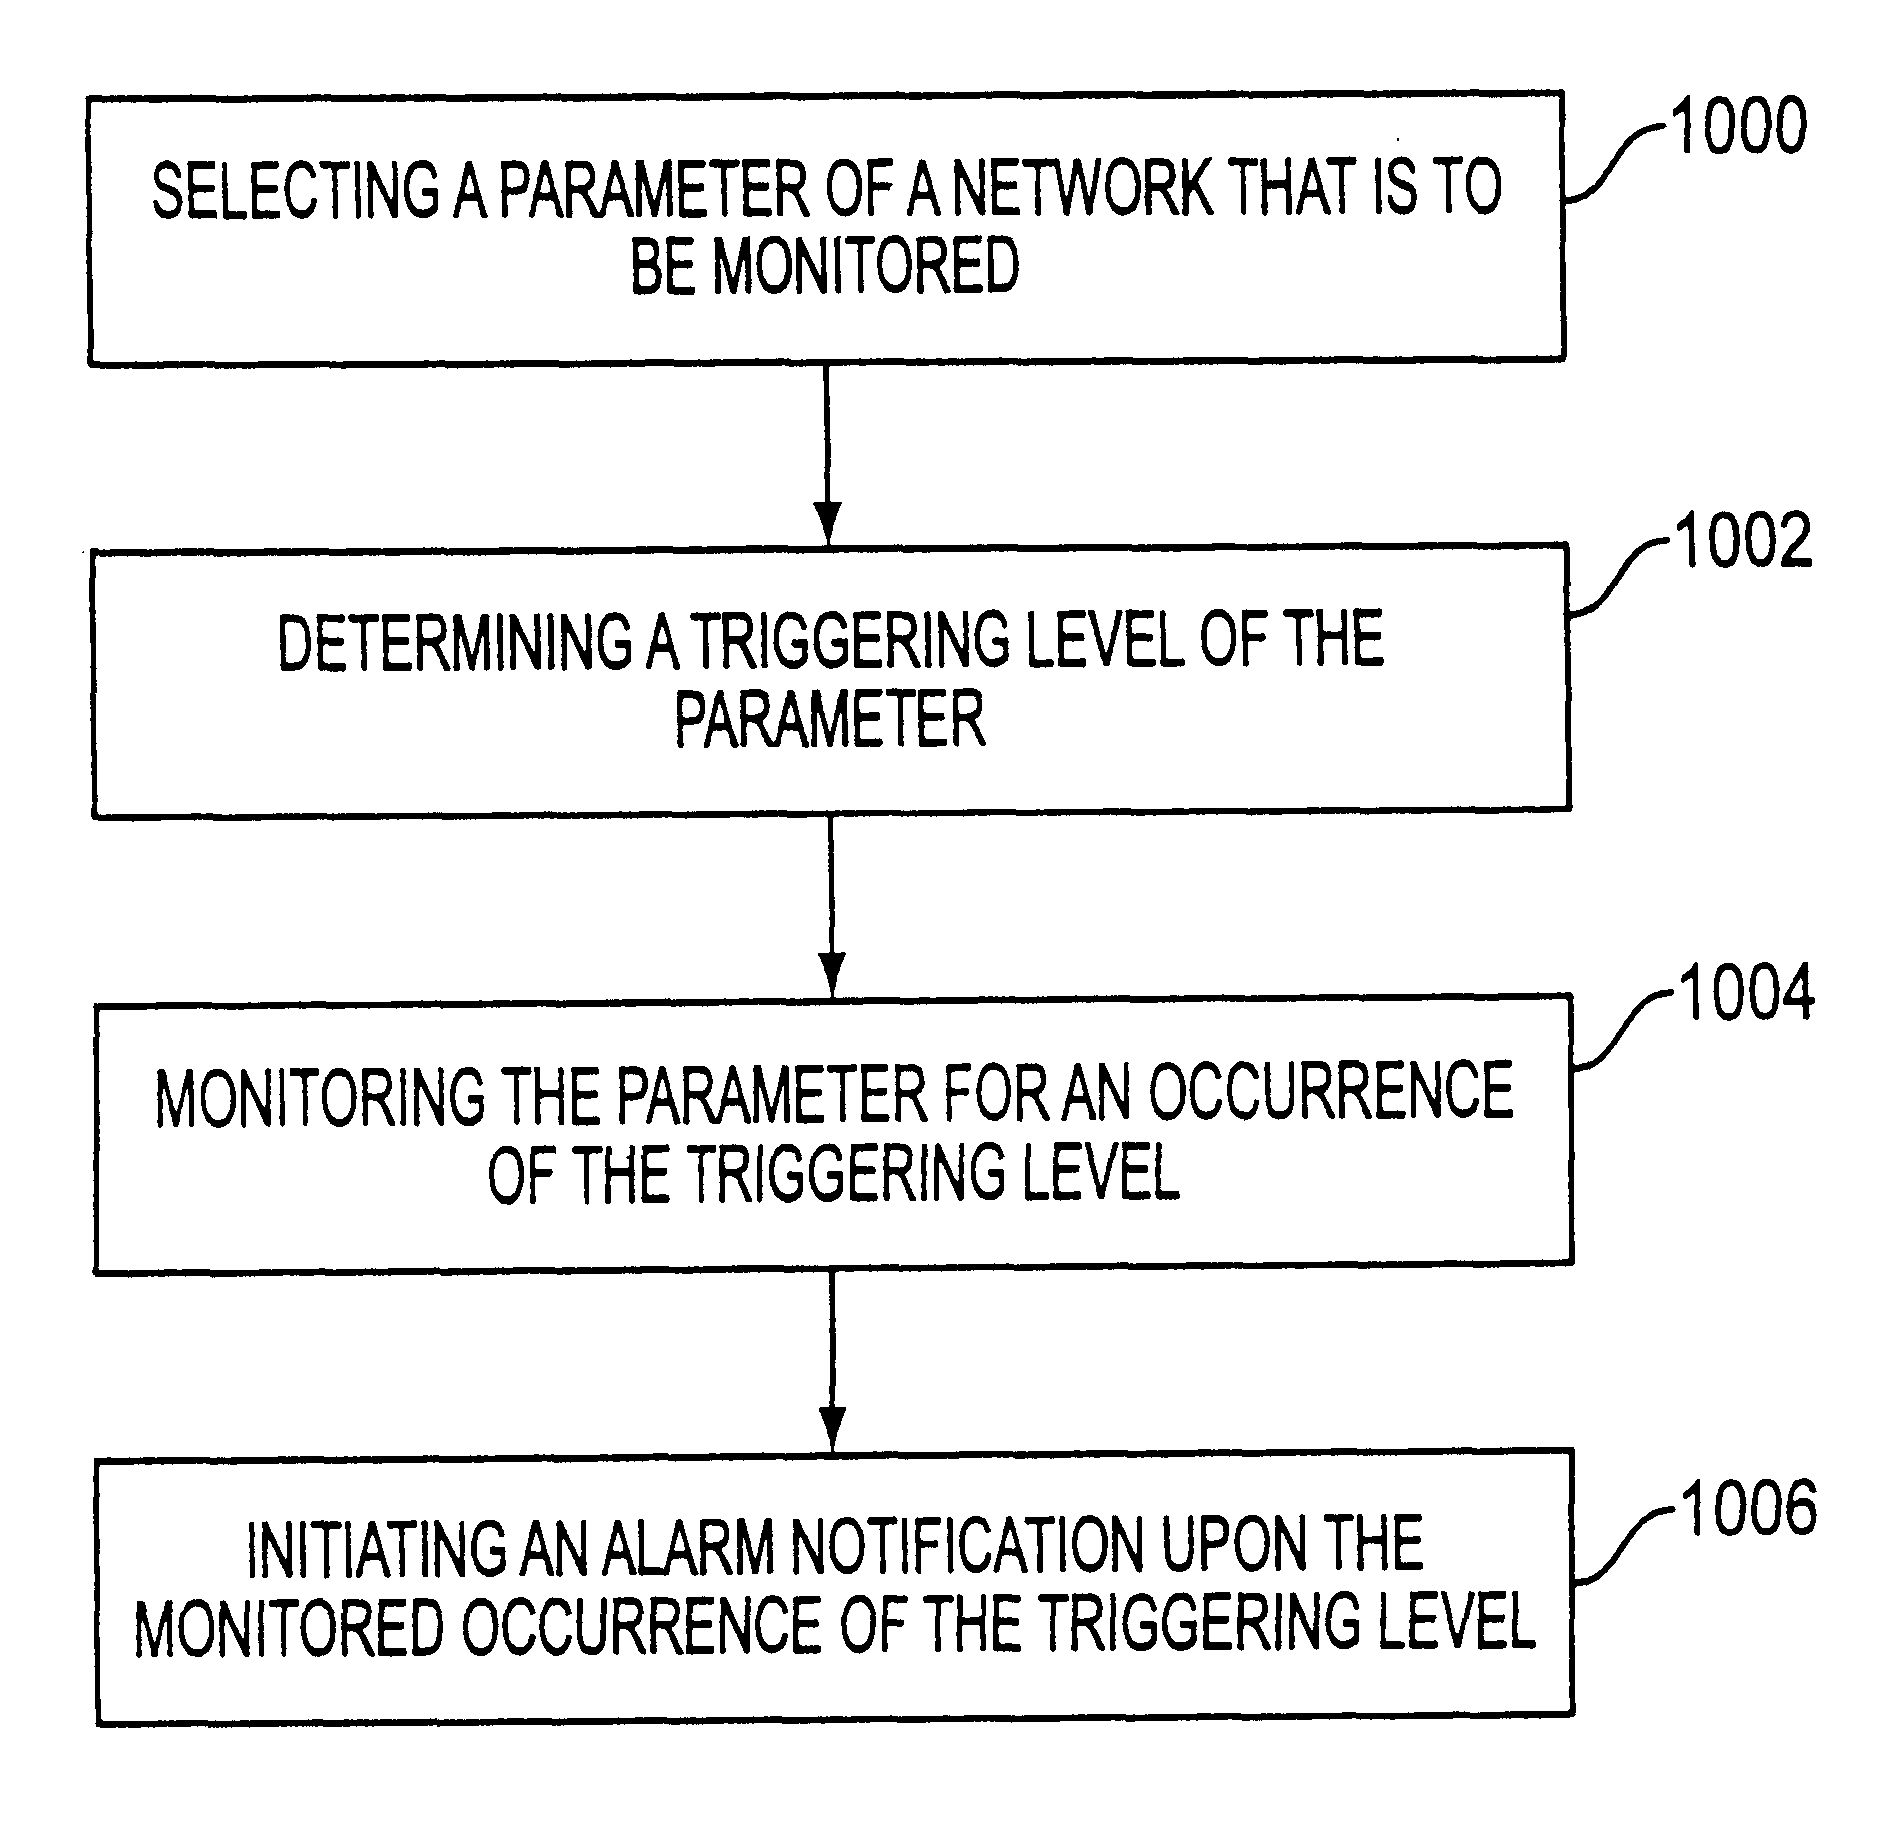 Patent US 6,571,285 B1